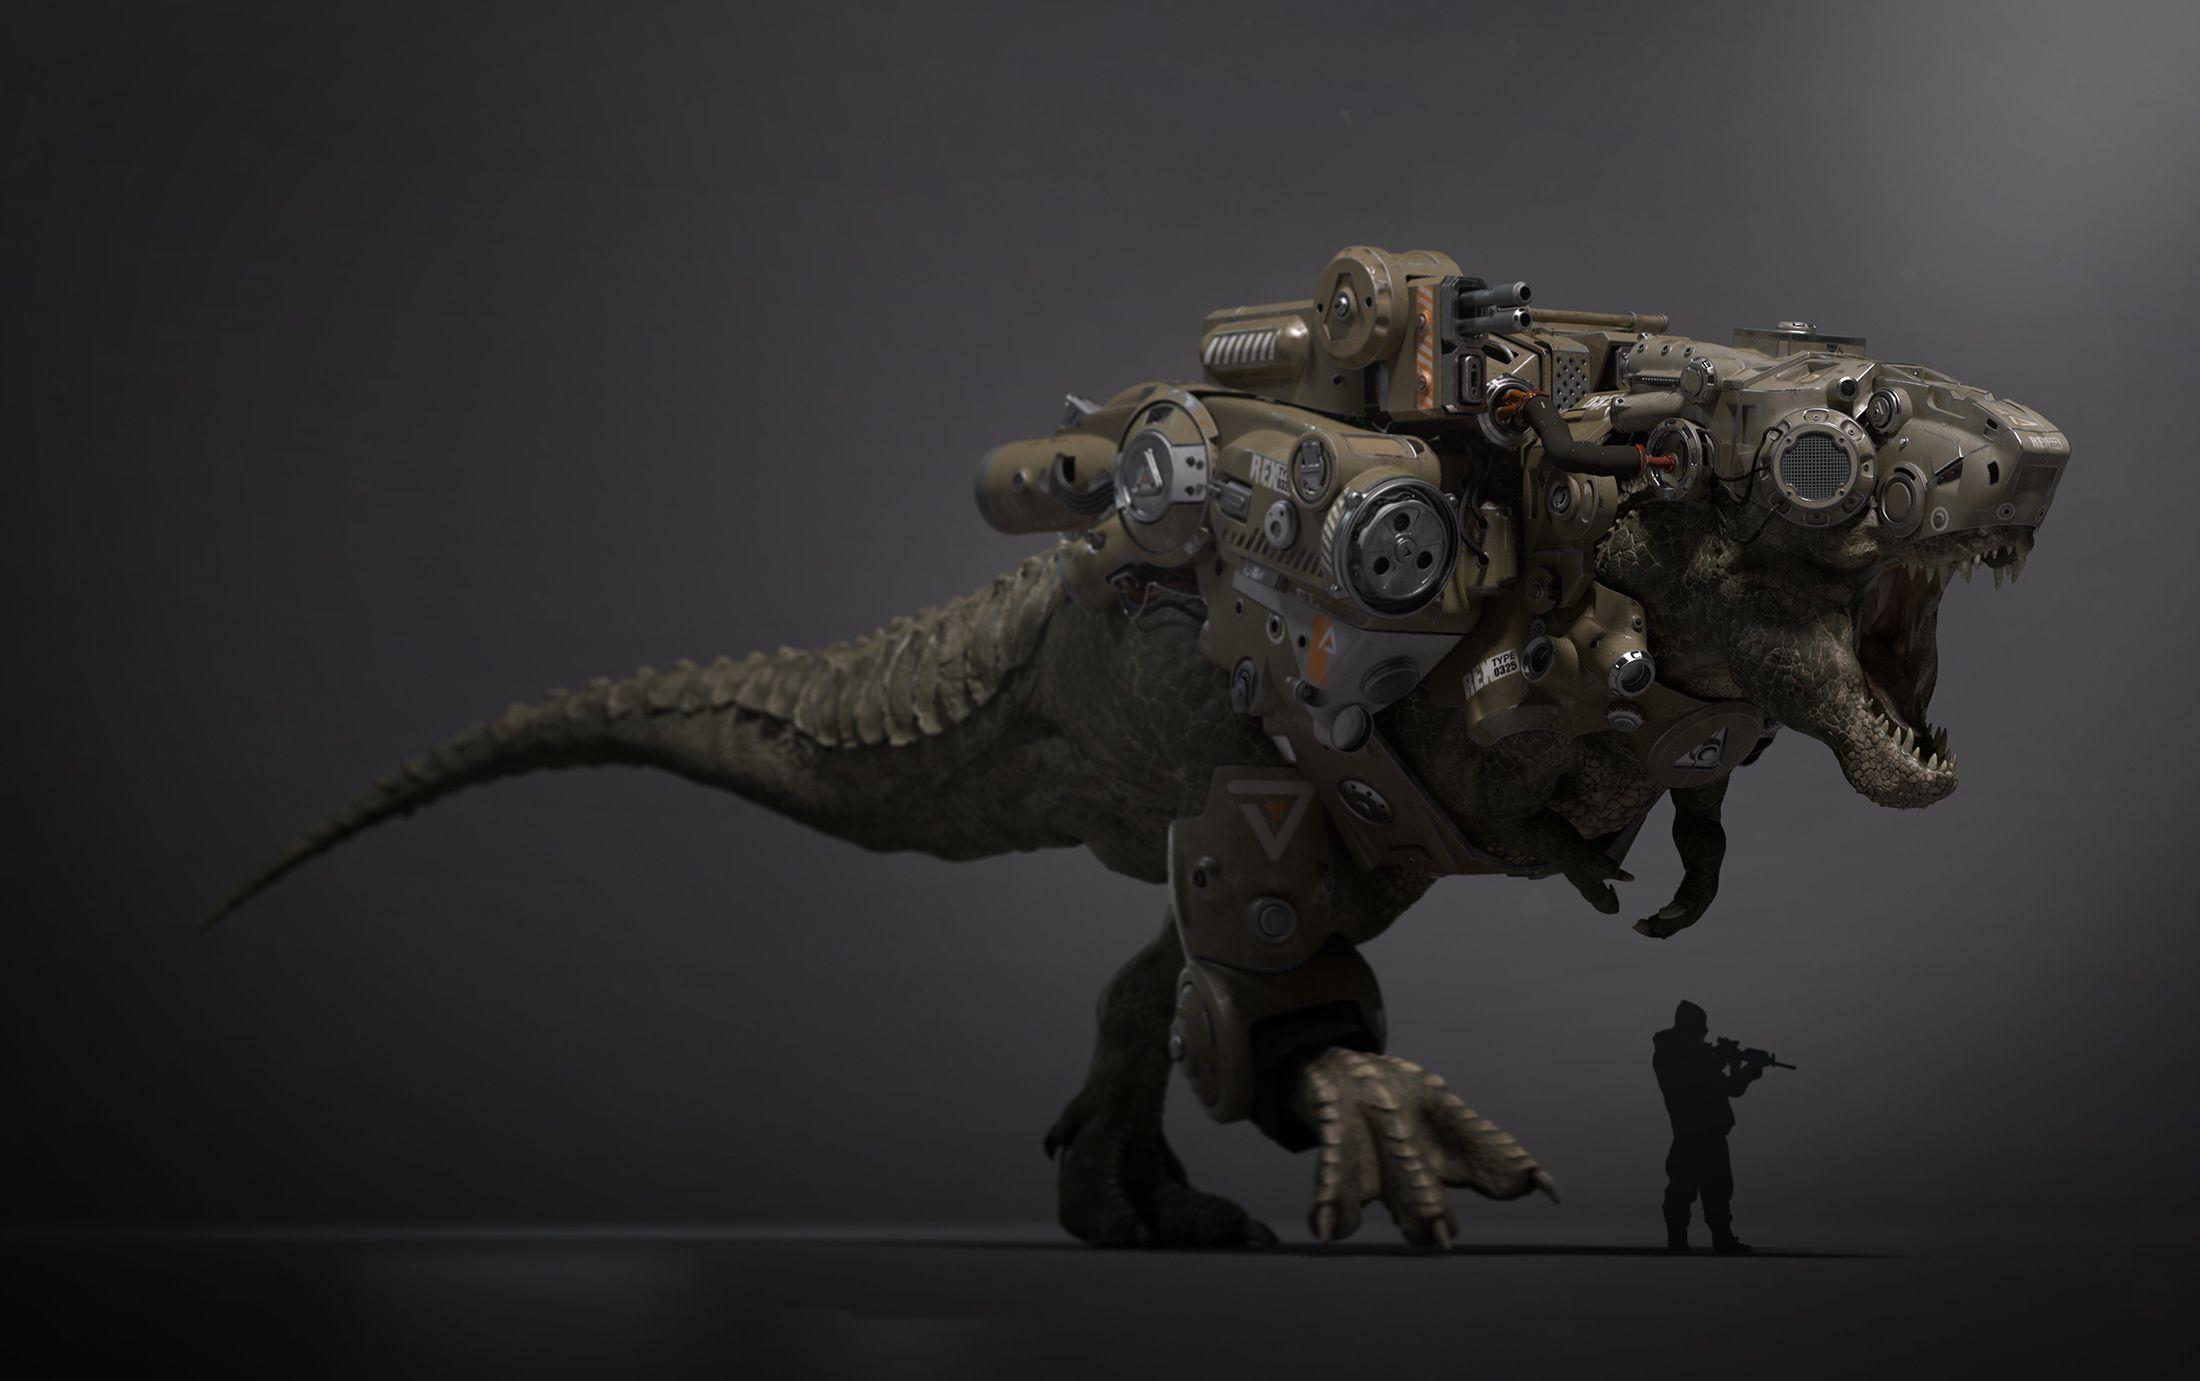 Warrior Rex By Pieman194 Fantasy 3d Cgsociety Robot Animal